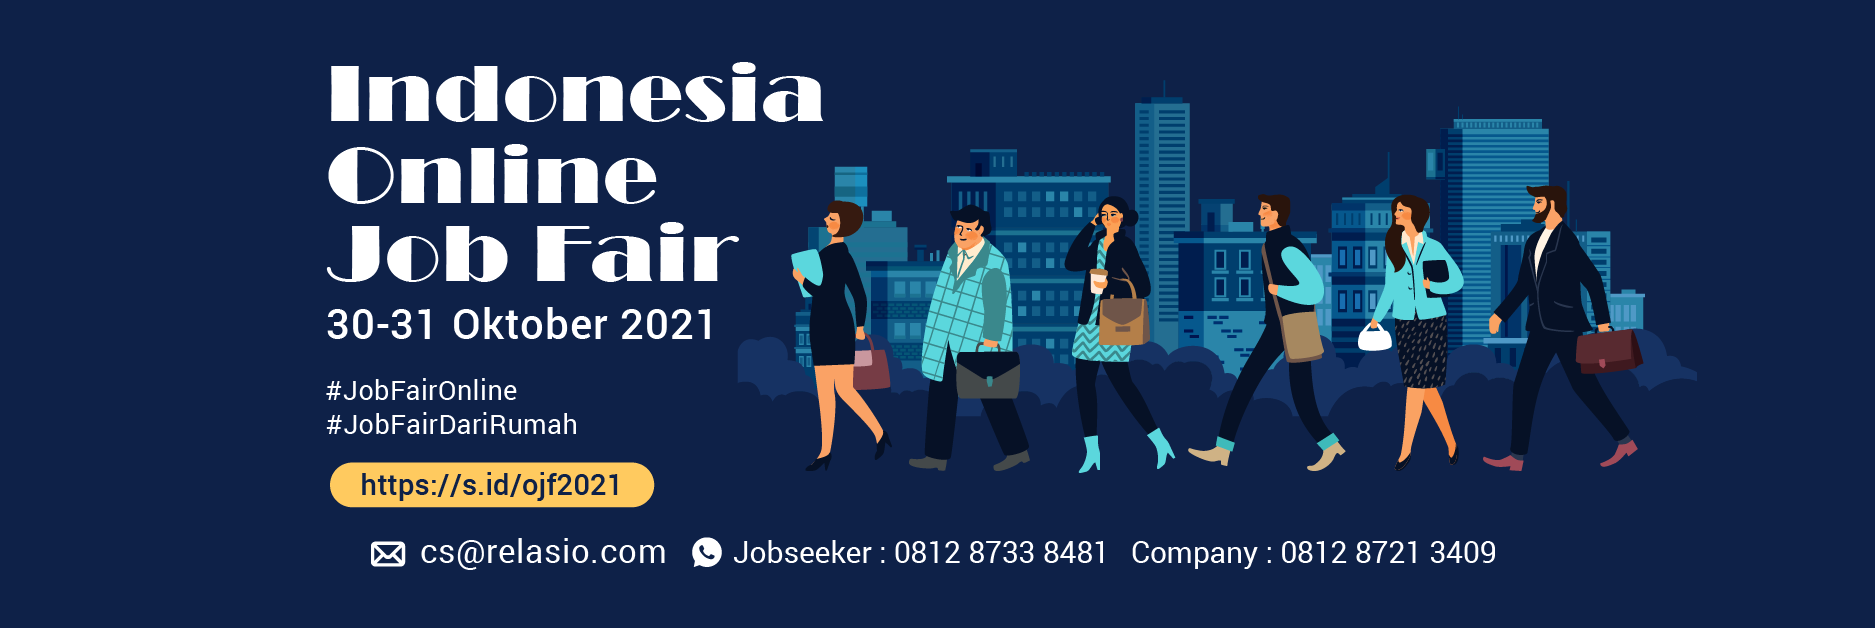 Job Fair Online Relasio.com Oktober 2021